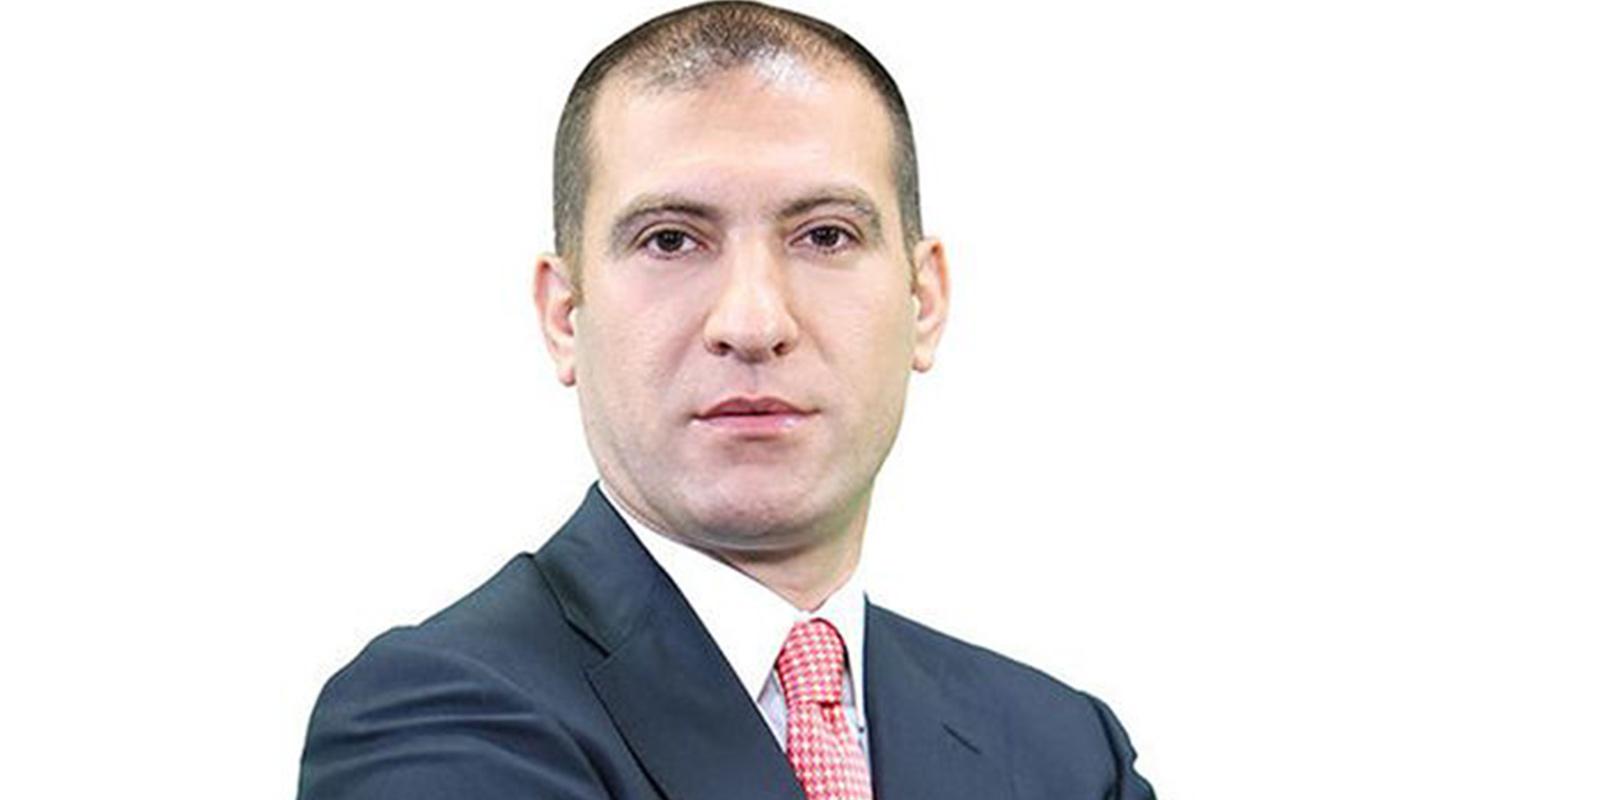 Flaş iddia: Bülent Aydemir'in görevine son verildi!